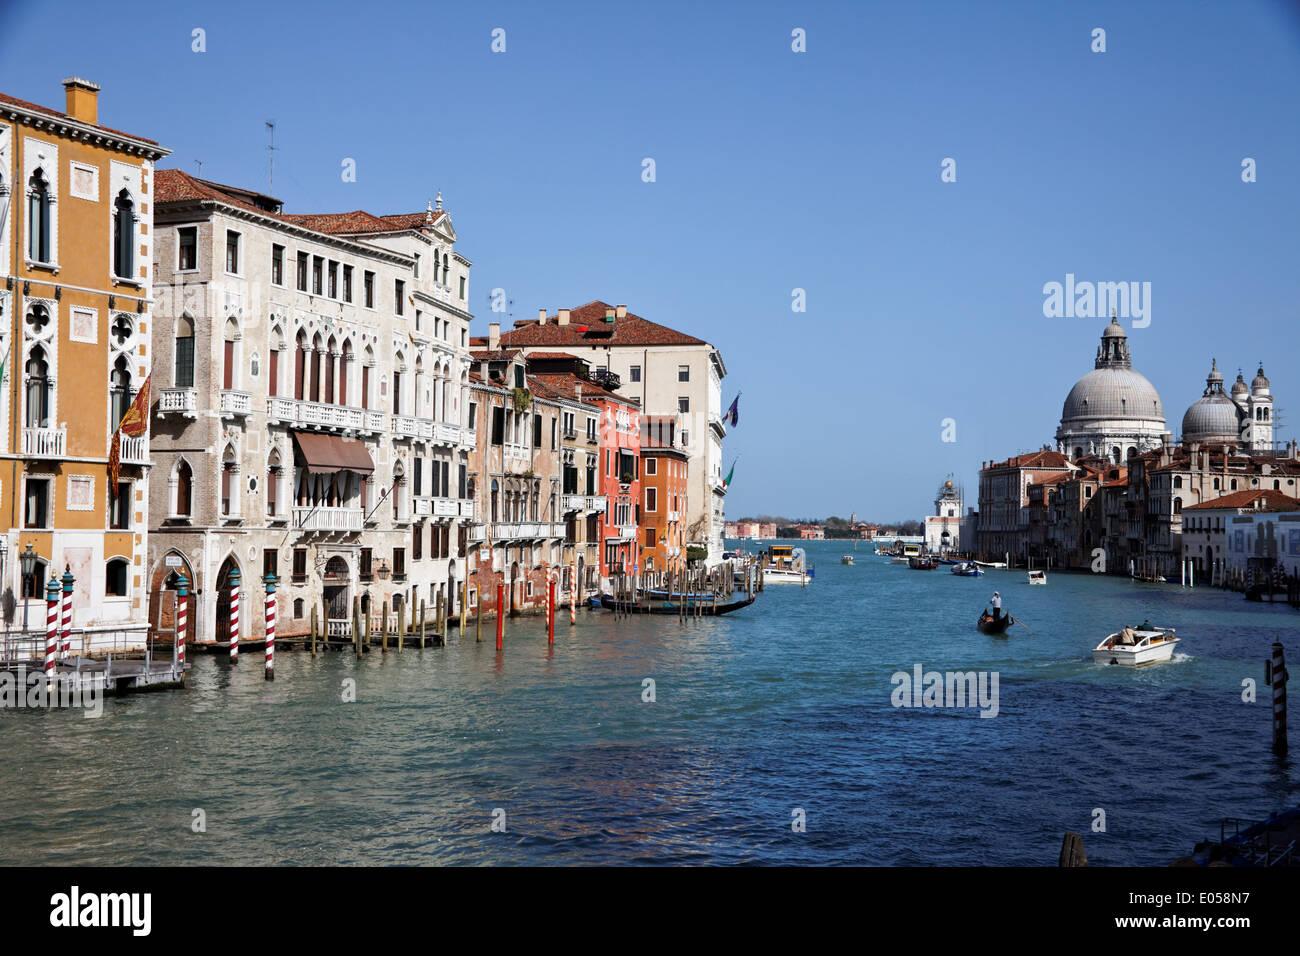 The famous Canale grandee in Venice, Italy, Europe, Der beruehmte Canale Grande in Venedig, Italien, Europa - Stock Image